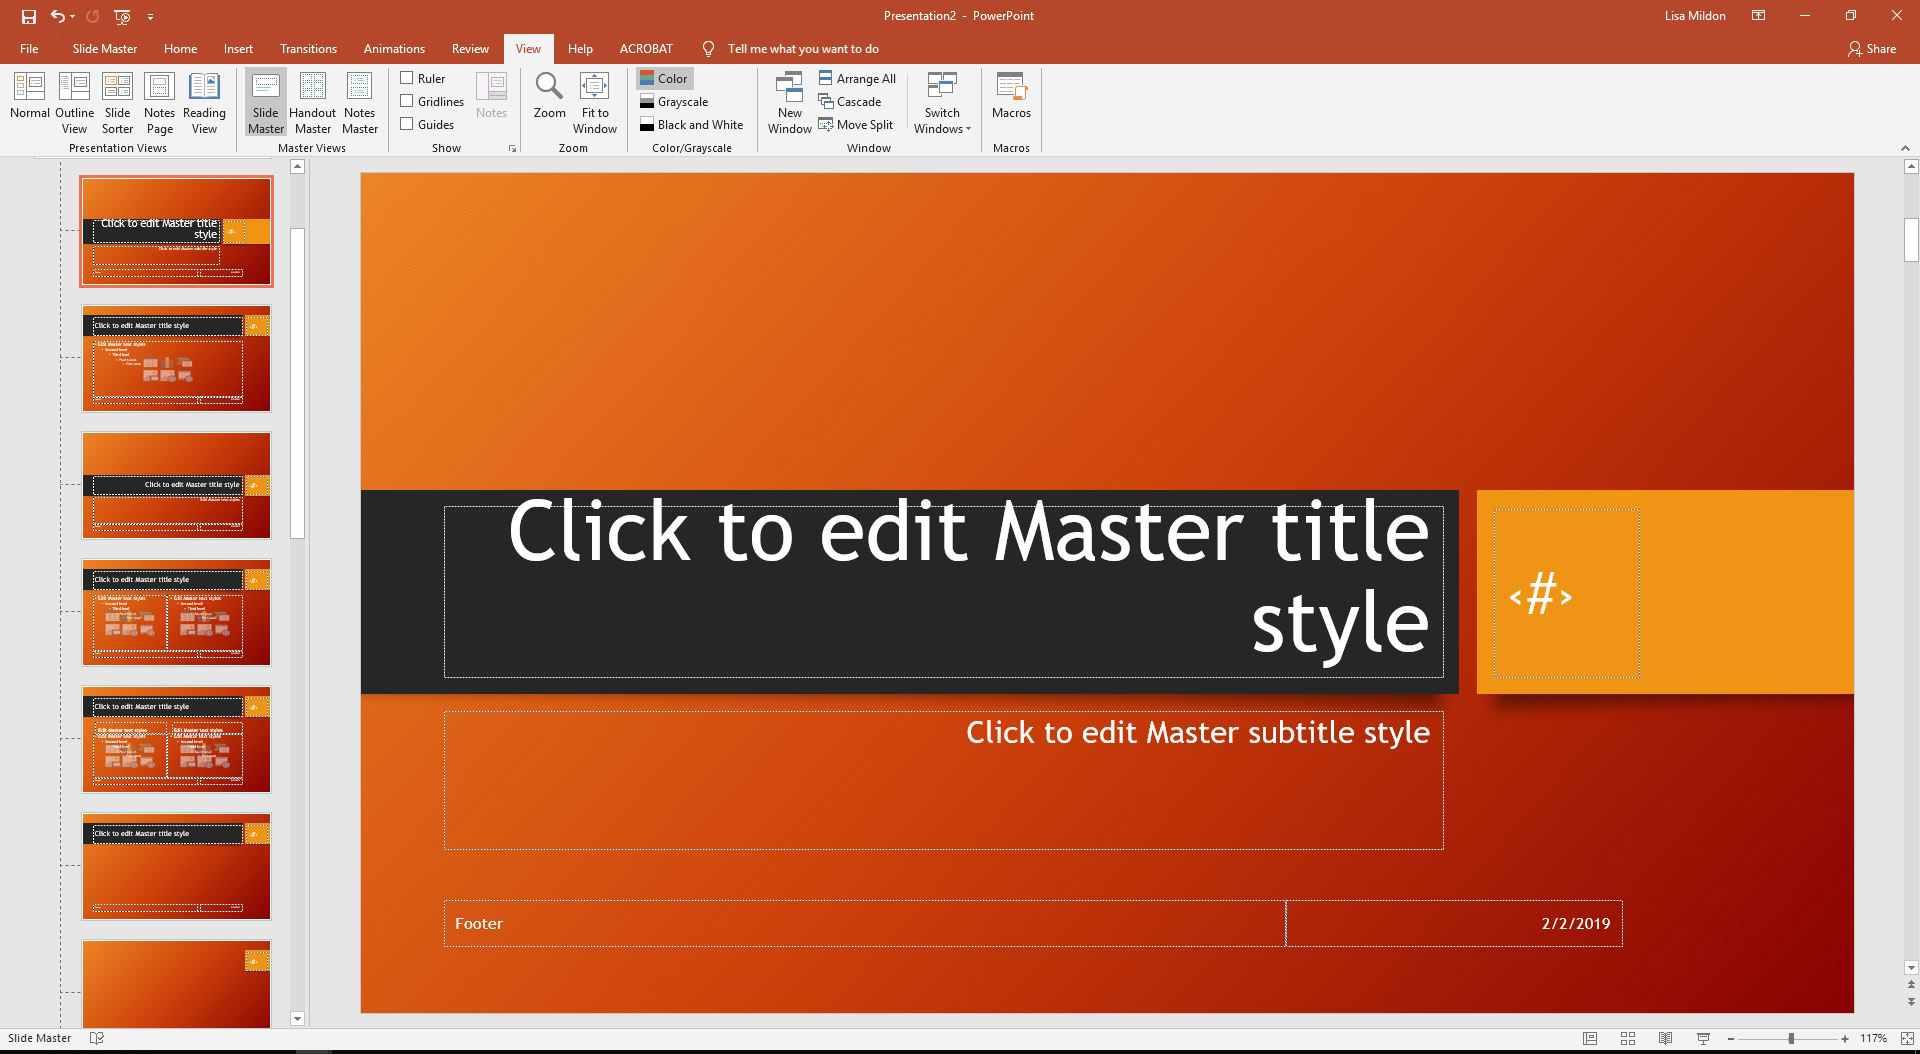 PowerPoint slideshow displaying Slide Master.